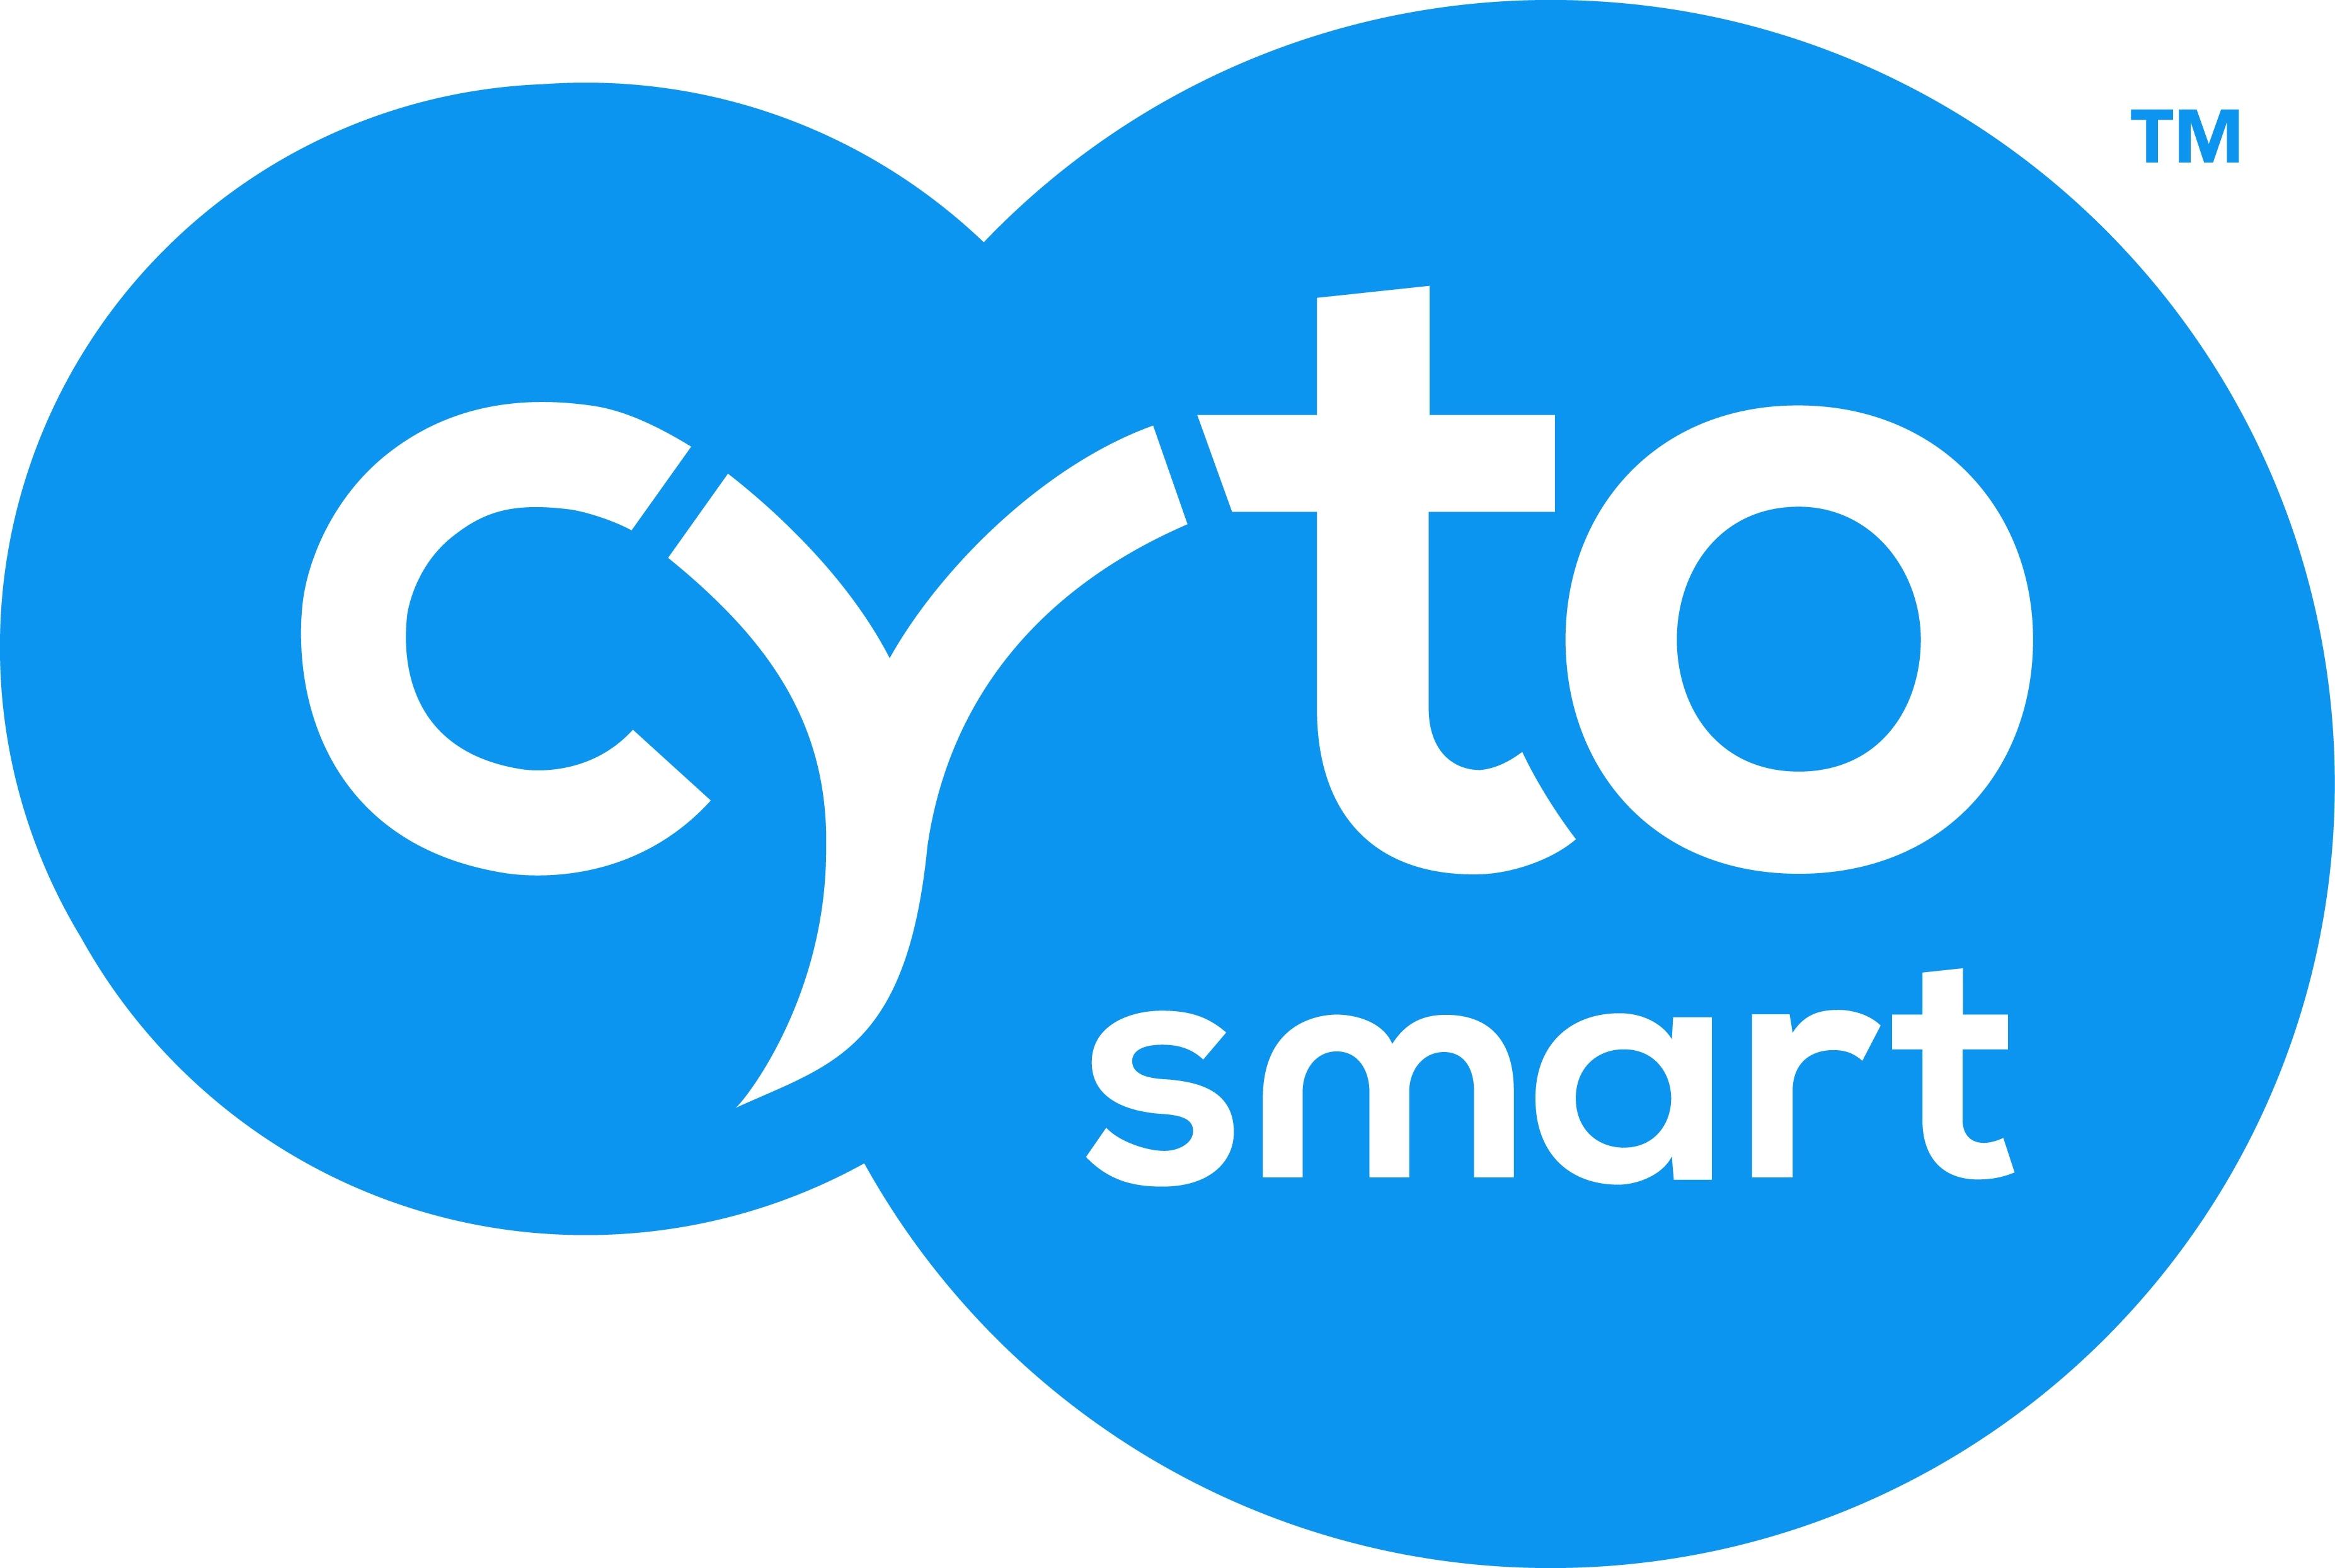 CytoSMART Tech